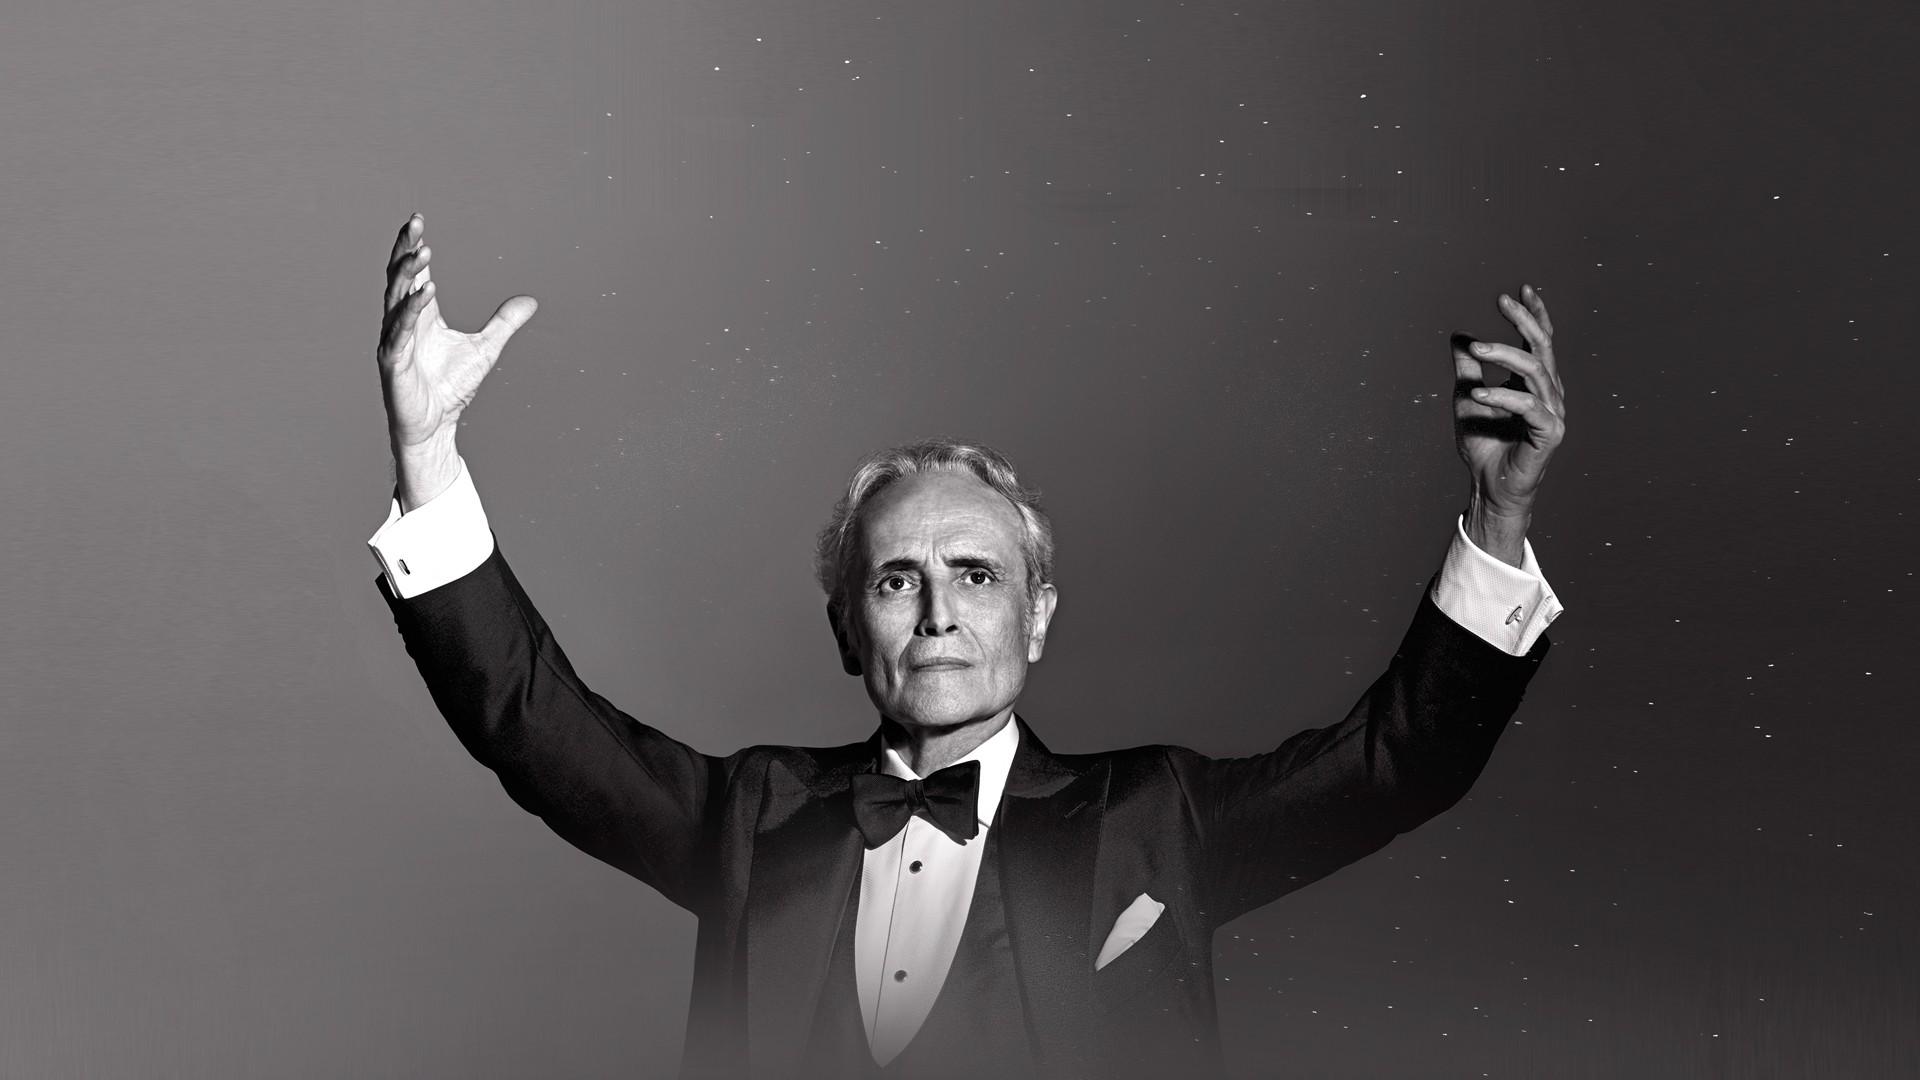 Хосе Каррерас. Концерт перенесен на 1 октября 2019 г.